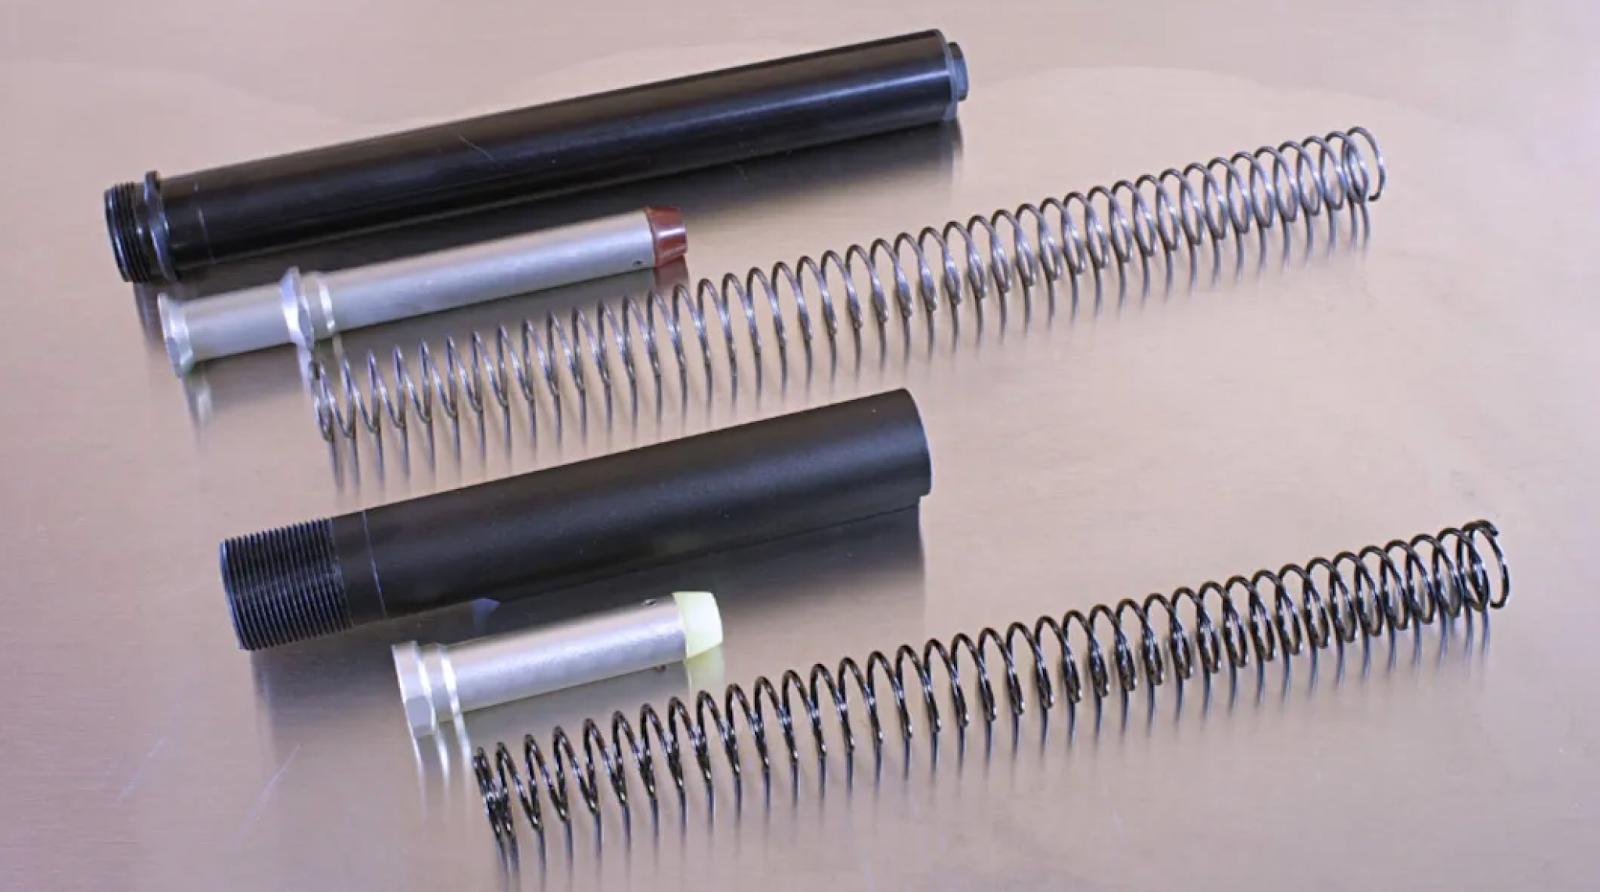 rifle length carbine and spring vs carbine buffer tube and carbine buffer and spring